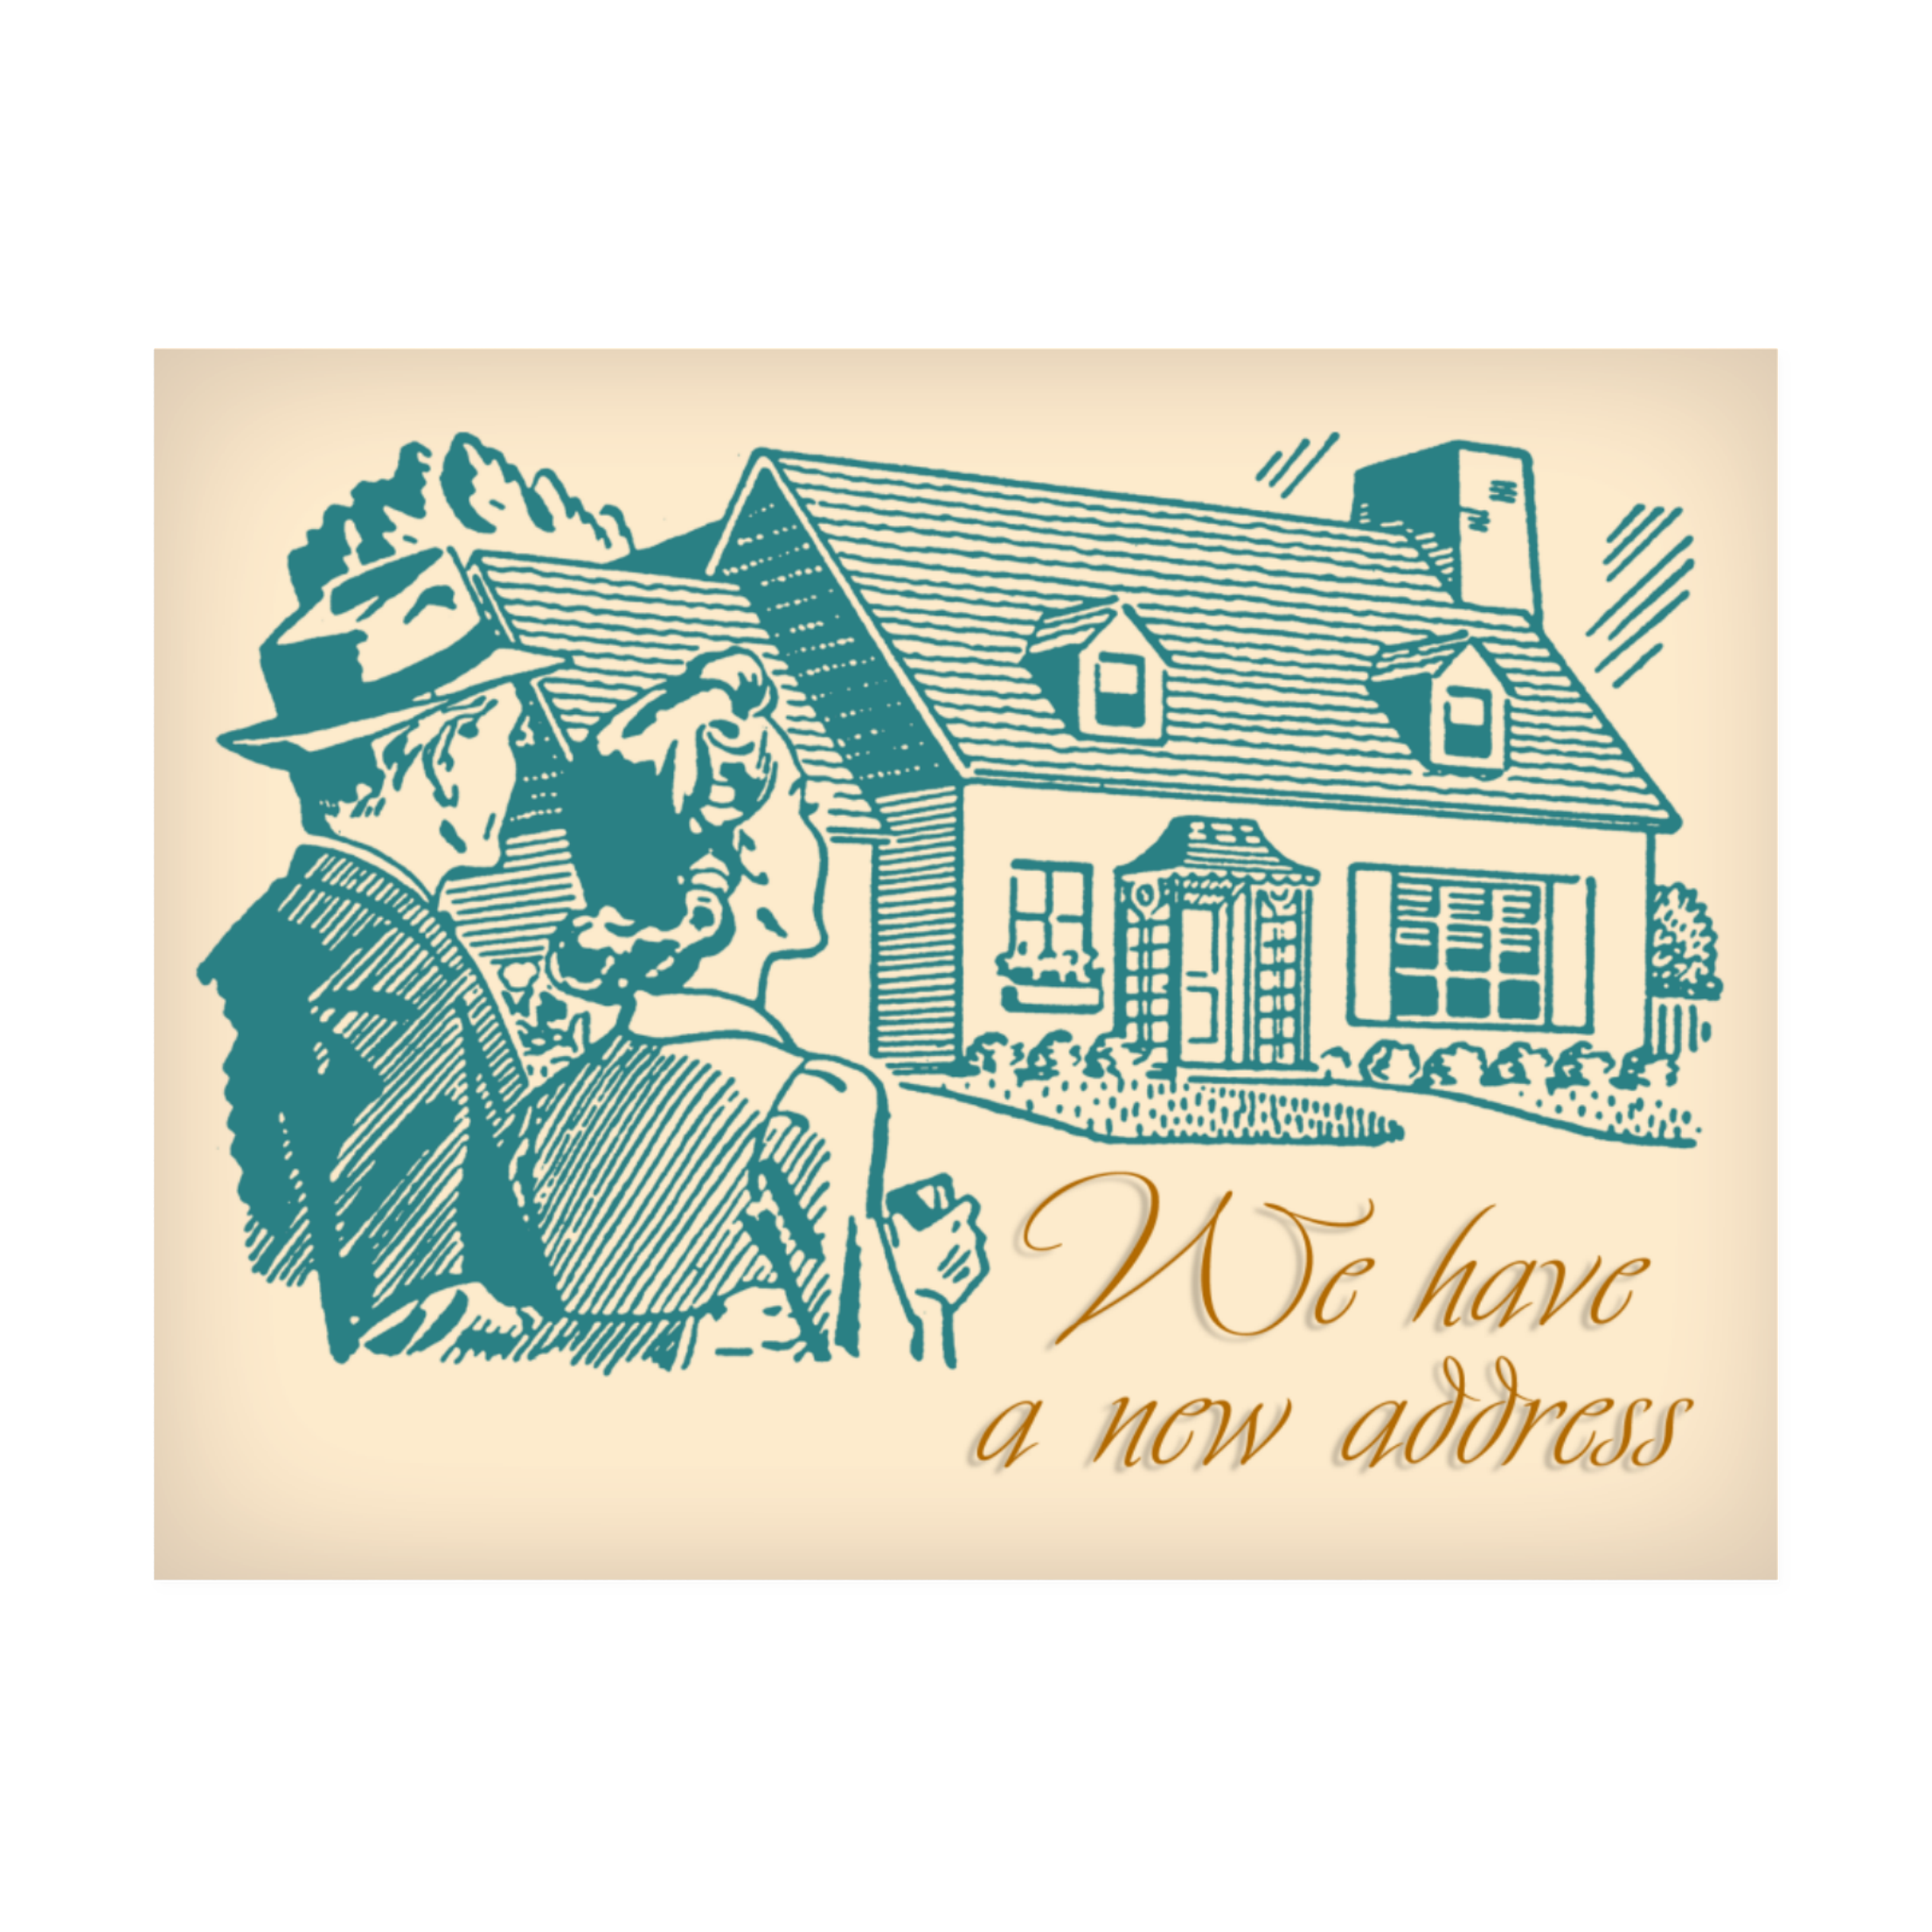 Retro House Change of Address Postcard